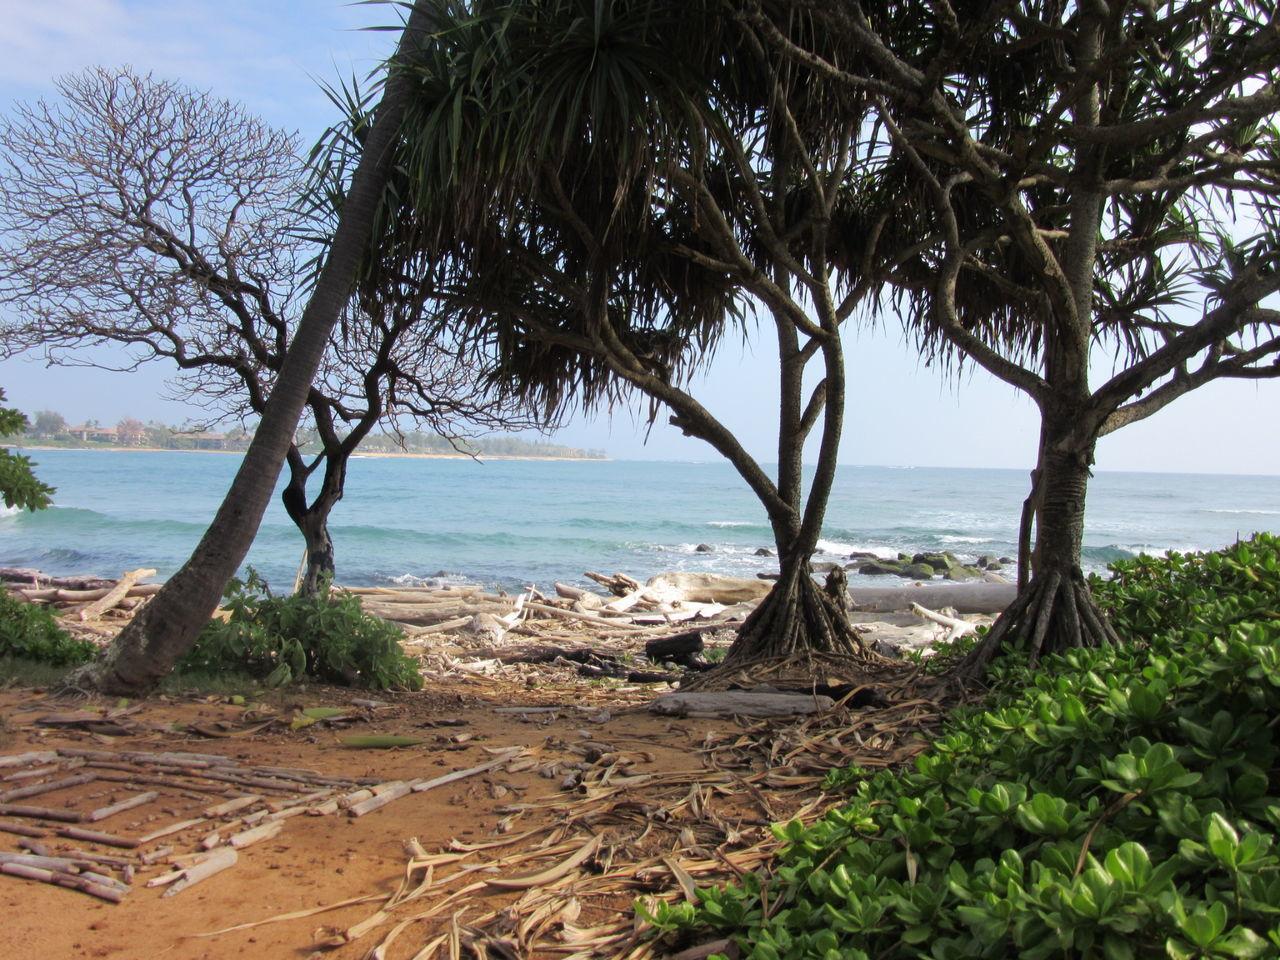 Sea Beach Tree Nature Water Horizon Over Water Outdoors Travel Destinations Scenics No People Beauty In Nature Branch Tree Driftwood Kauai Hawaii